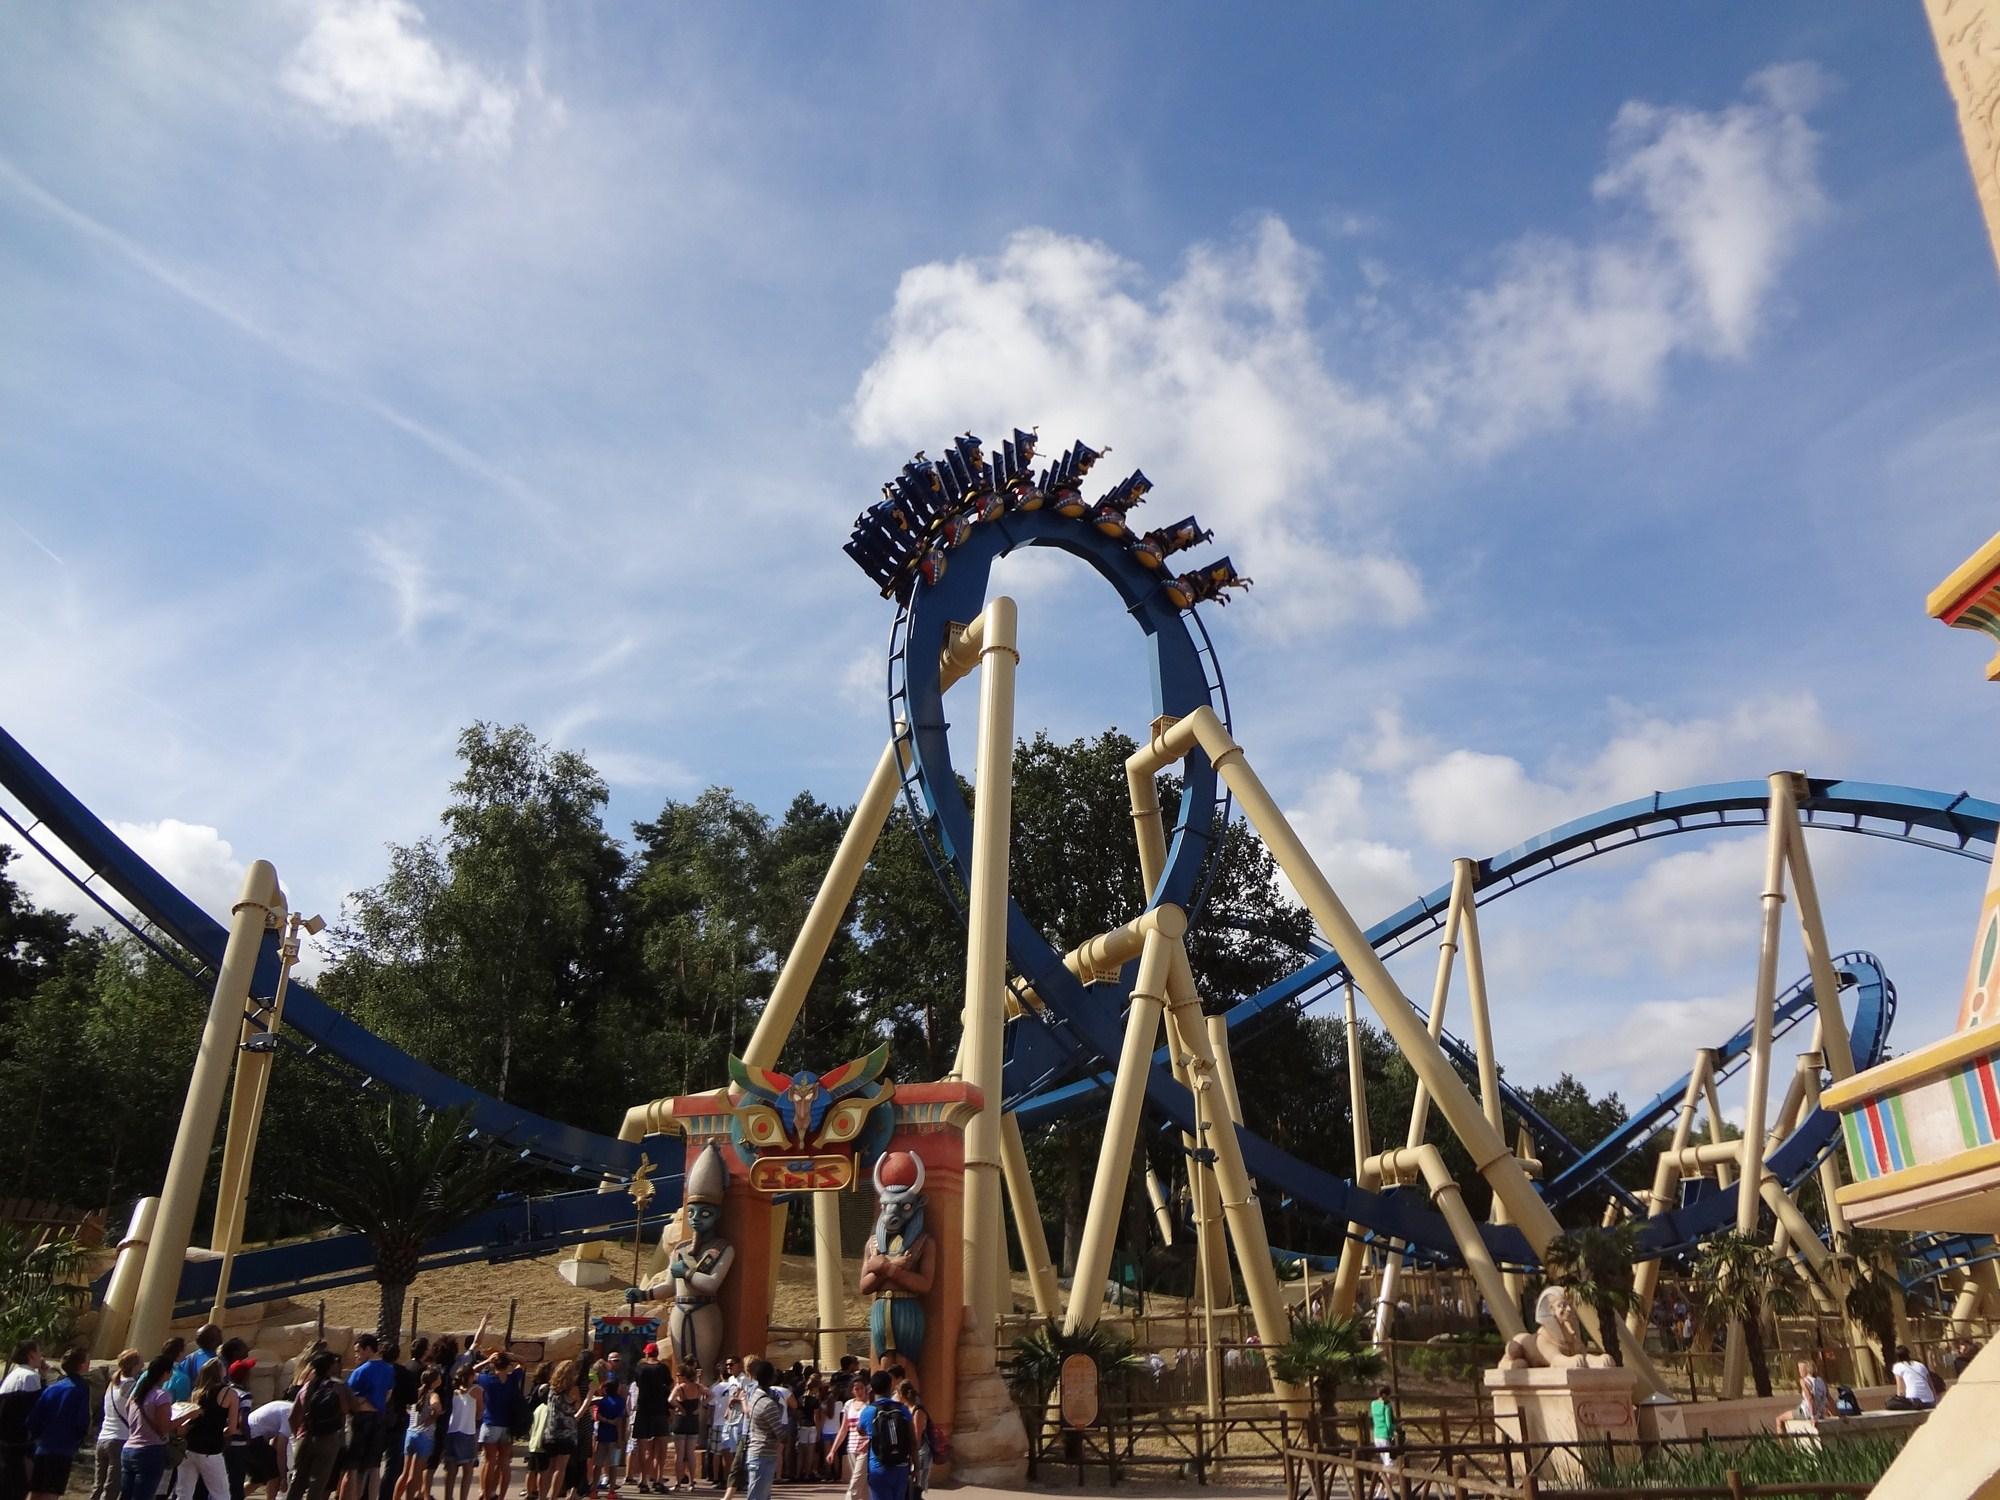 2012-08-16-Parc_Asterix-16.JPG